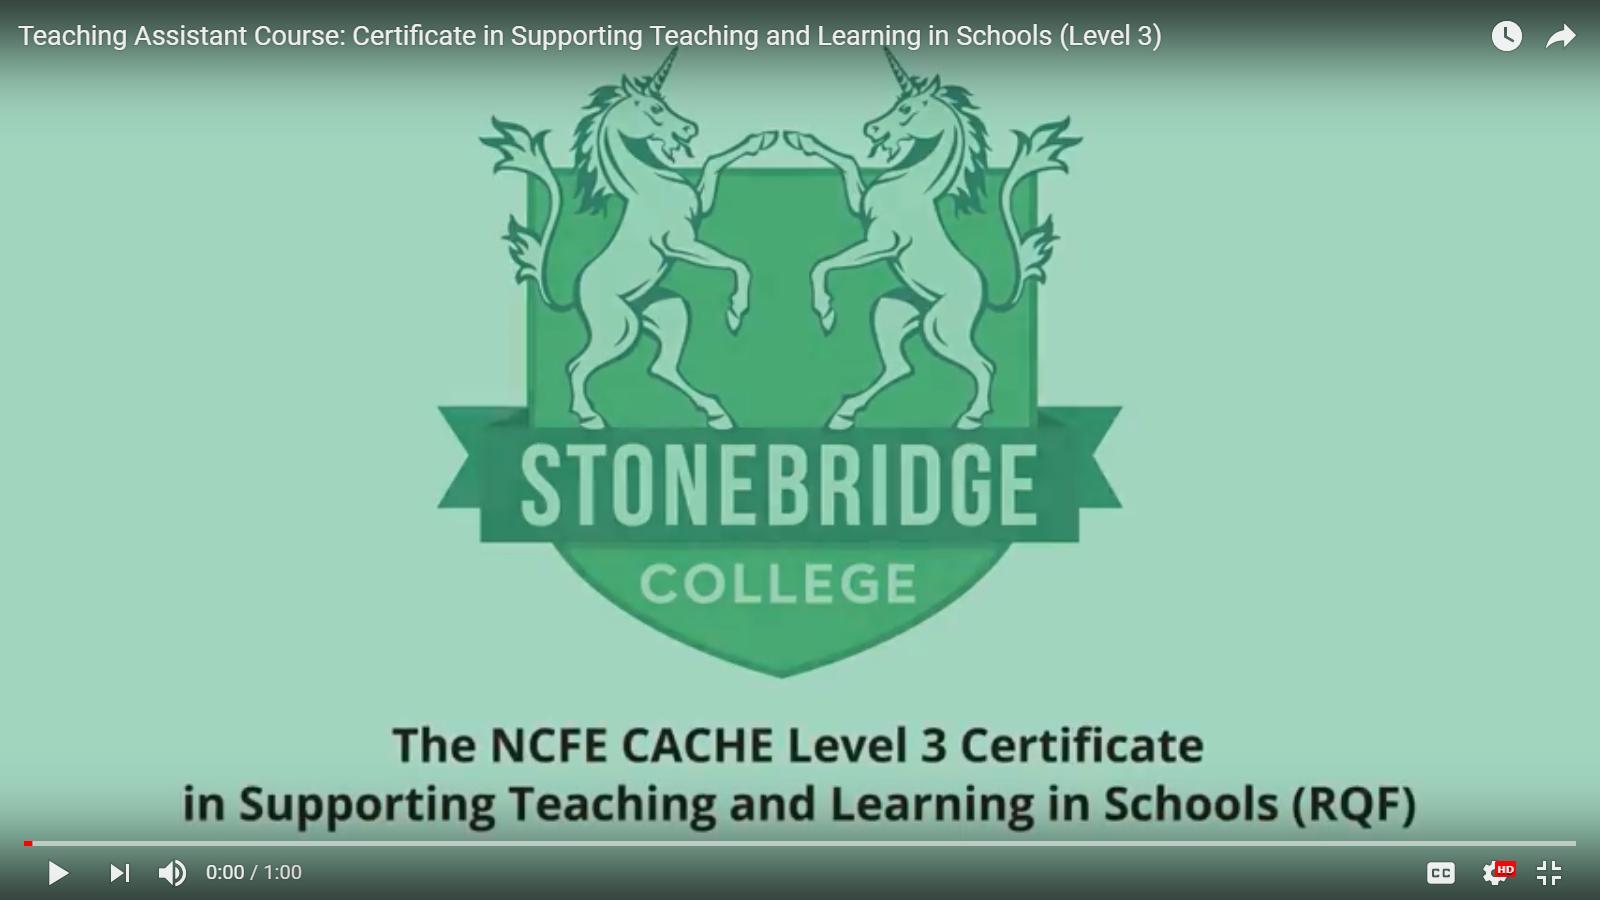 Stonebridge Careers Training Teaching Assistant Course